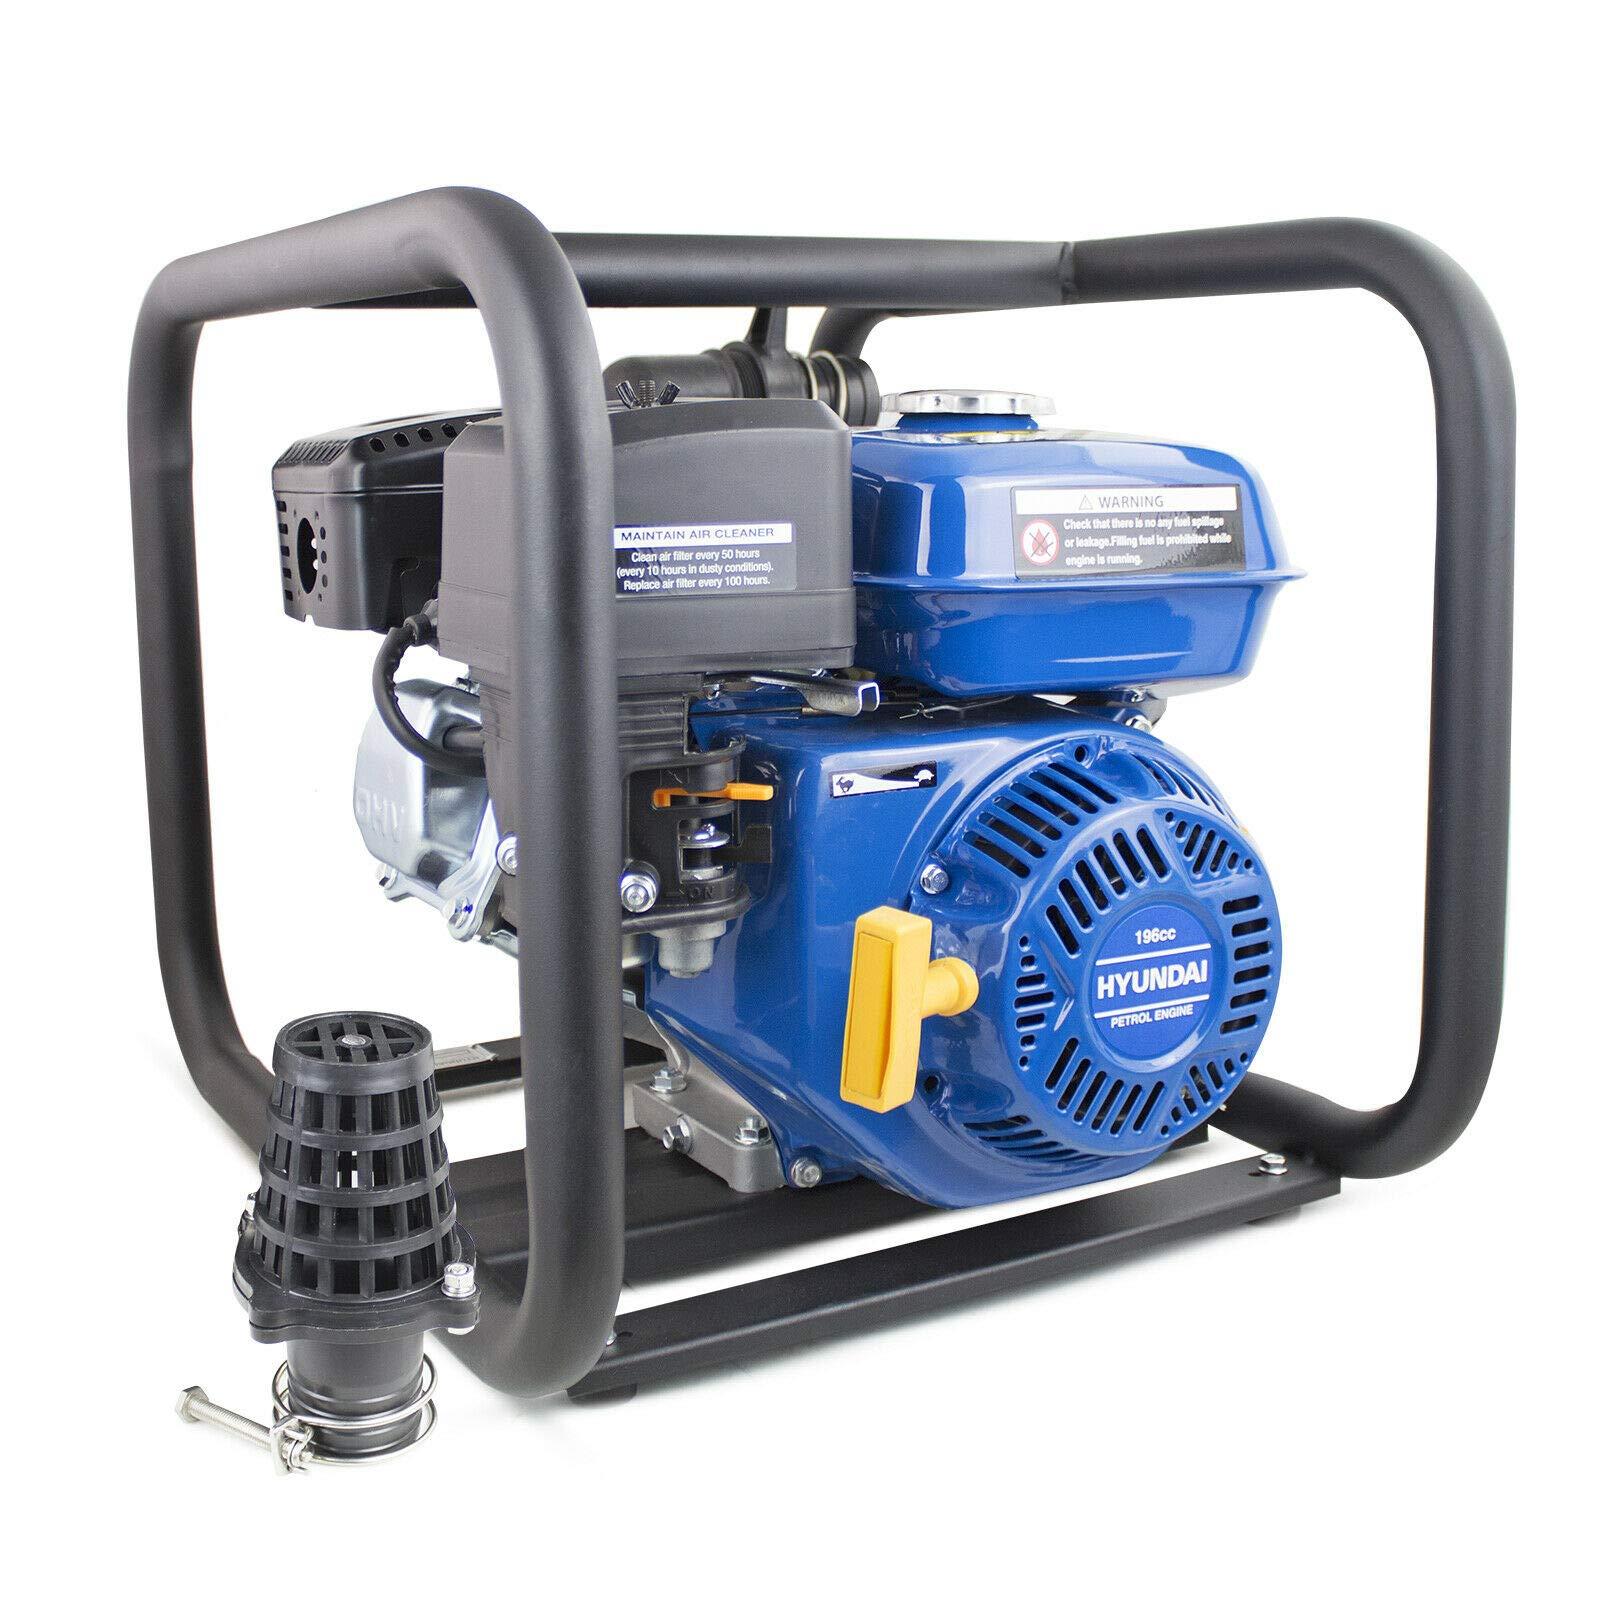 Hyundai HYC50 2 inch (50 mm) Professional Petrol Chemical Water Pump